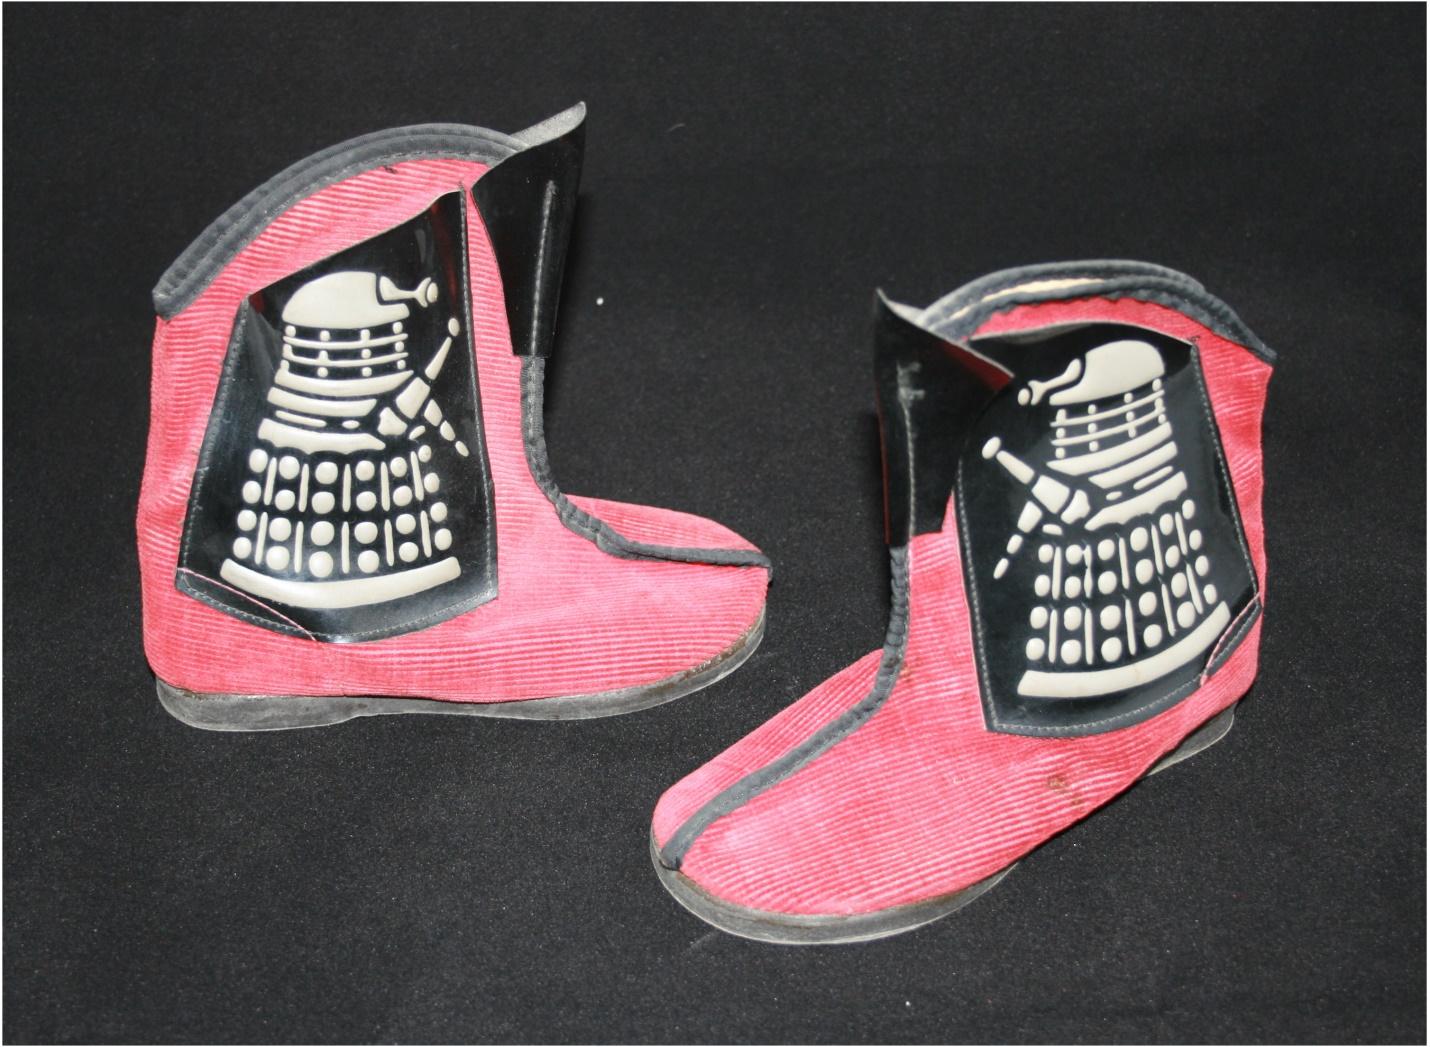 Furness Footwear Ltd., Dalek slippers (second version with embossed Daleks on plastic pockets). WANTED - Original shoebox.